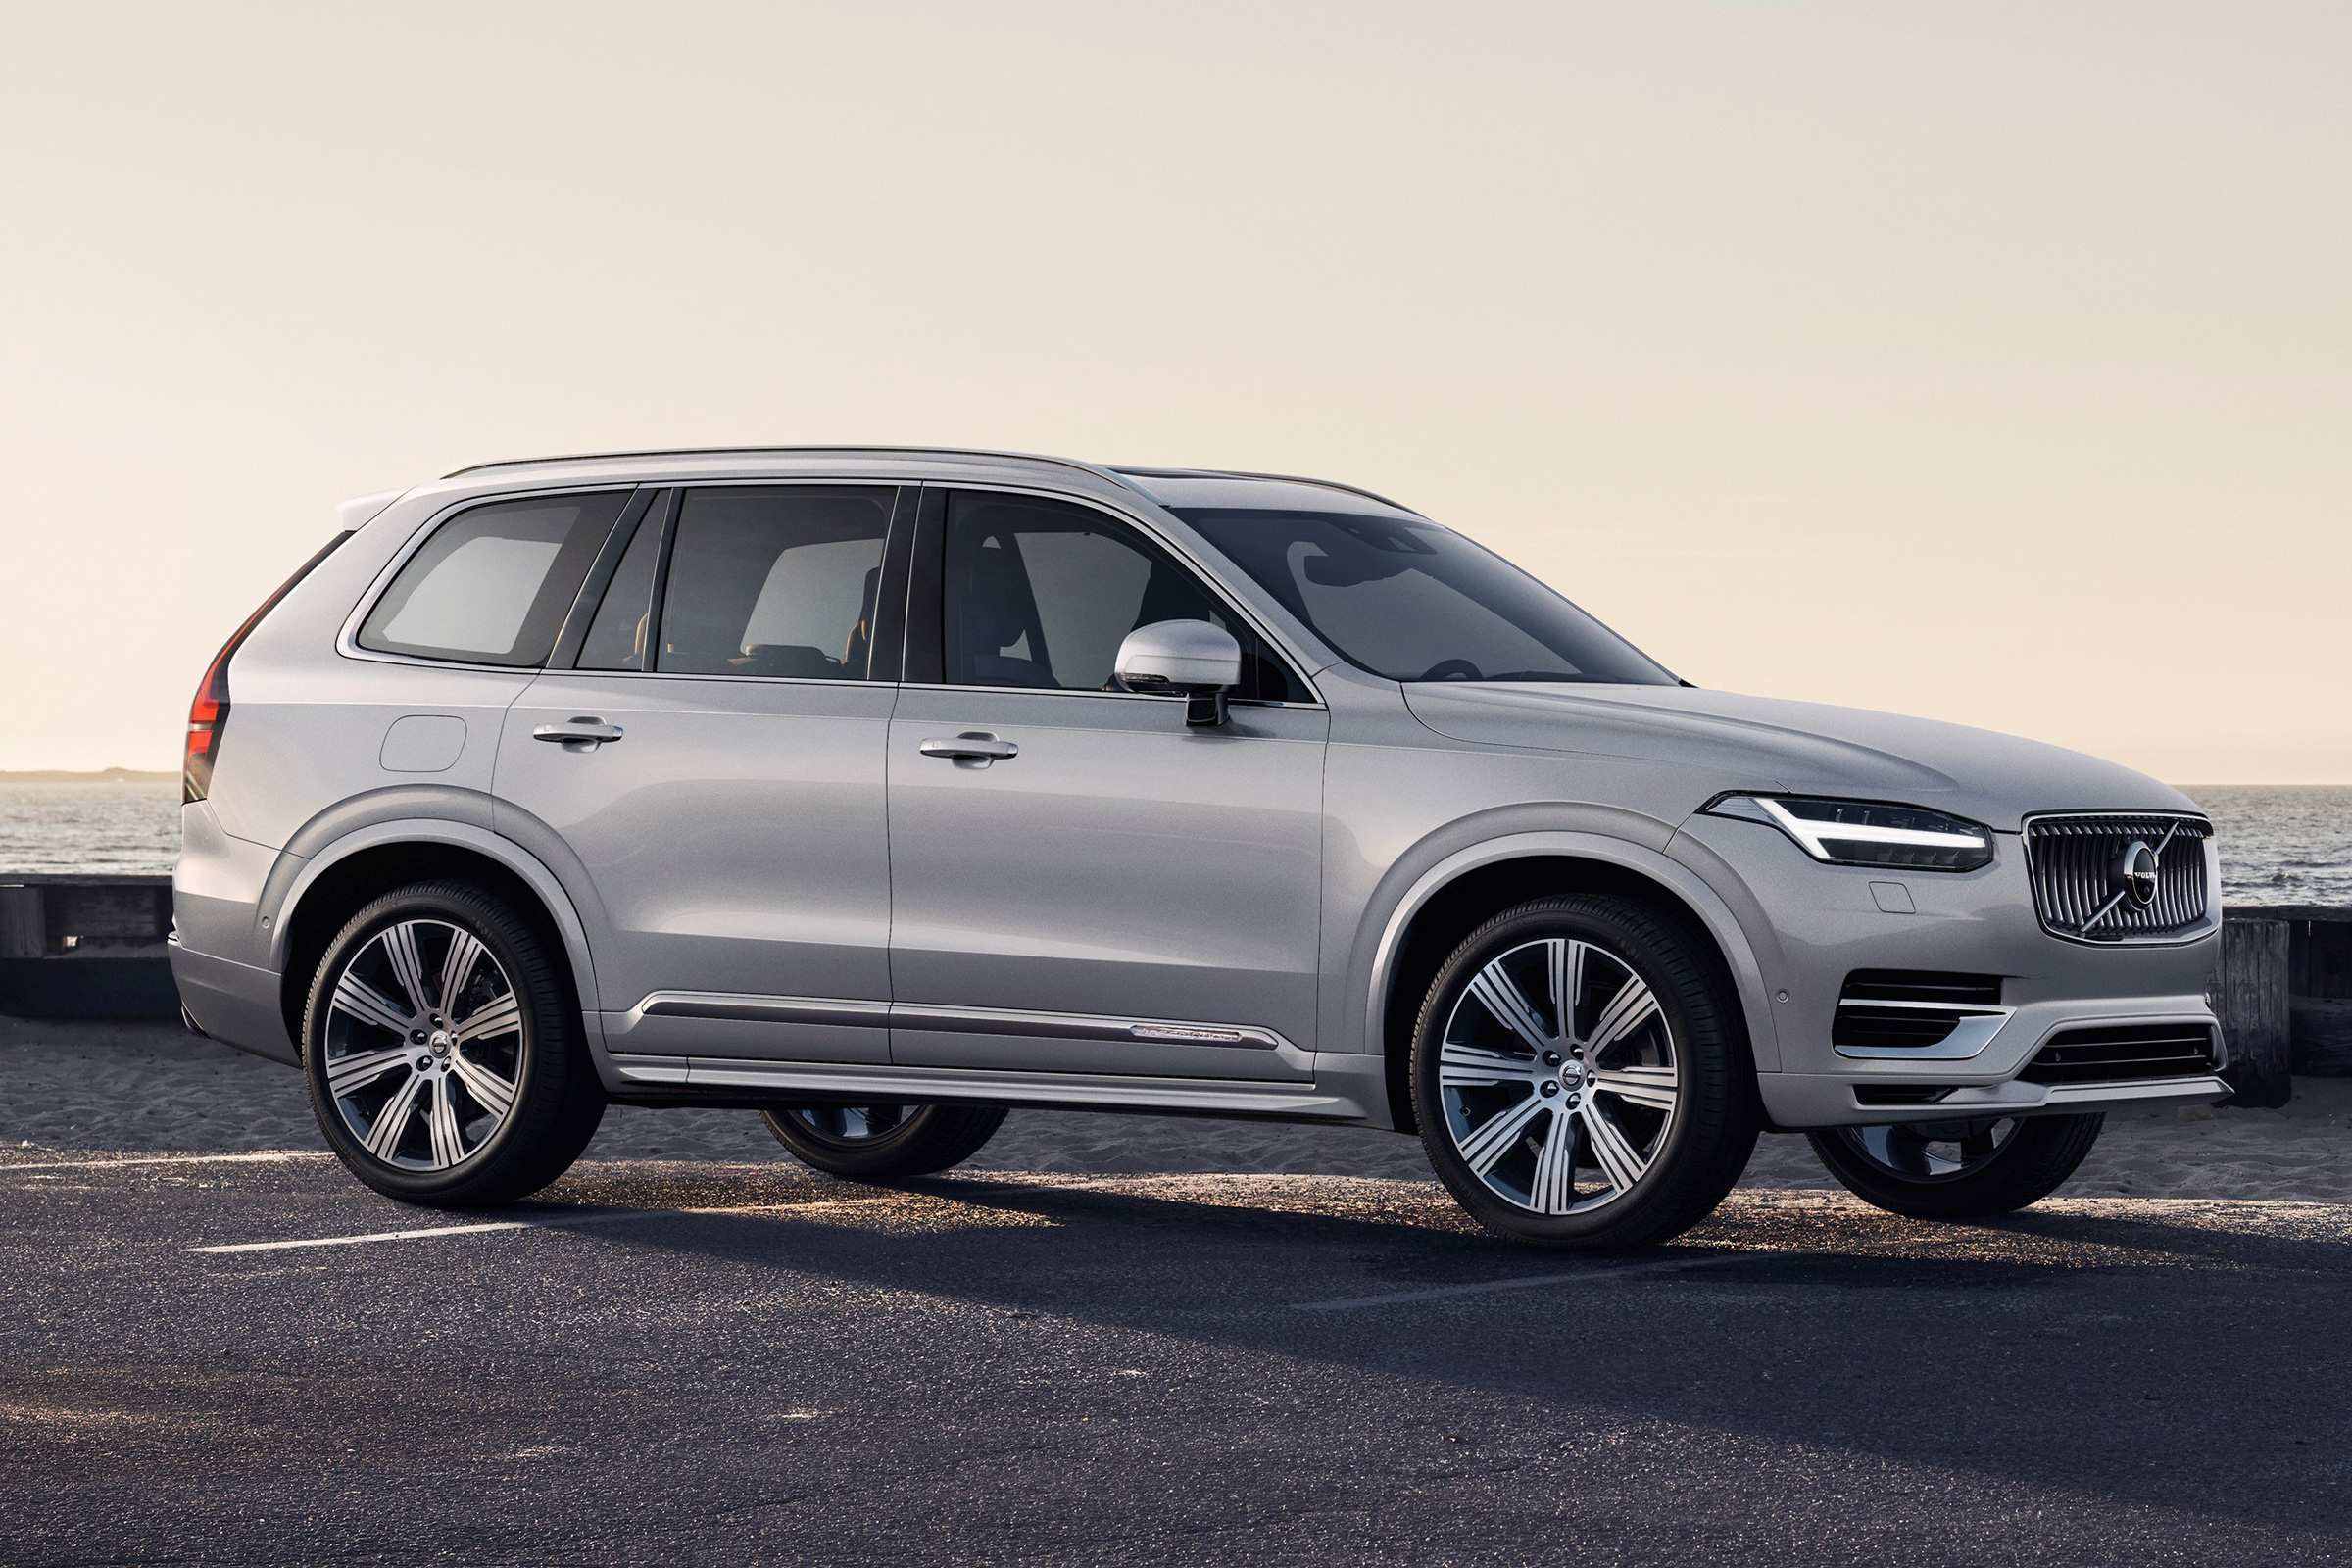 90 Best Review Volvo Xc90 Facelift 2019 Rumors for Volvo Xc90 Facelift 2019